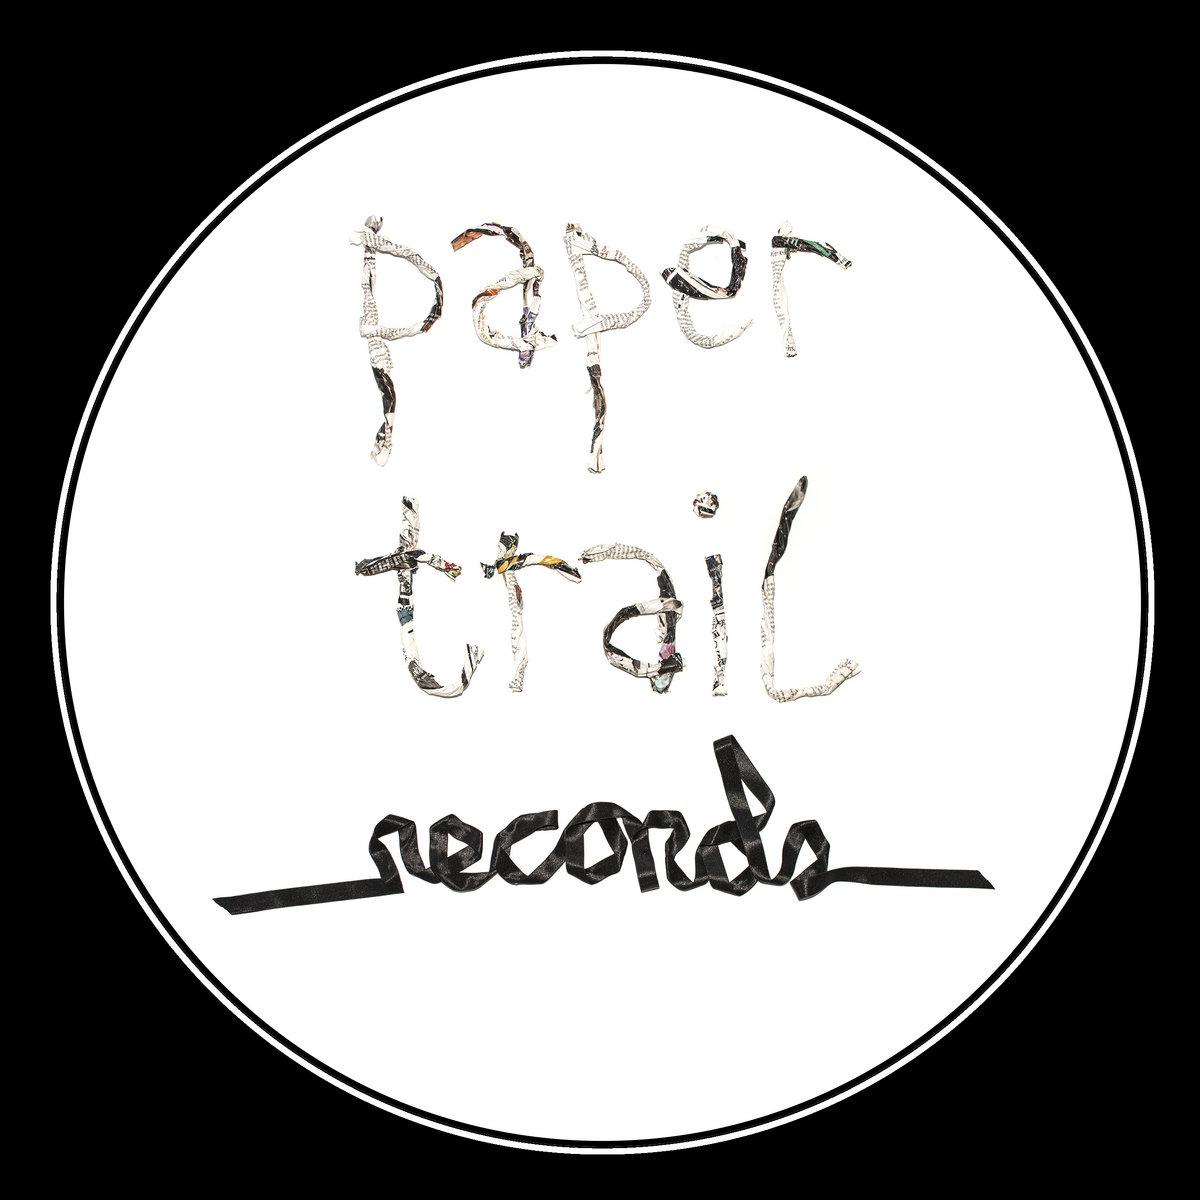 ti paper trail free download